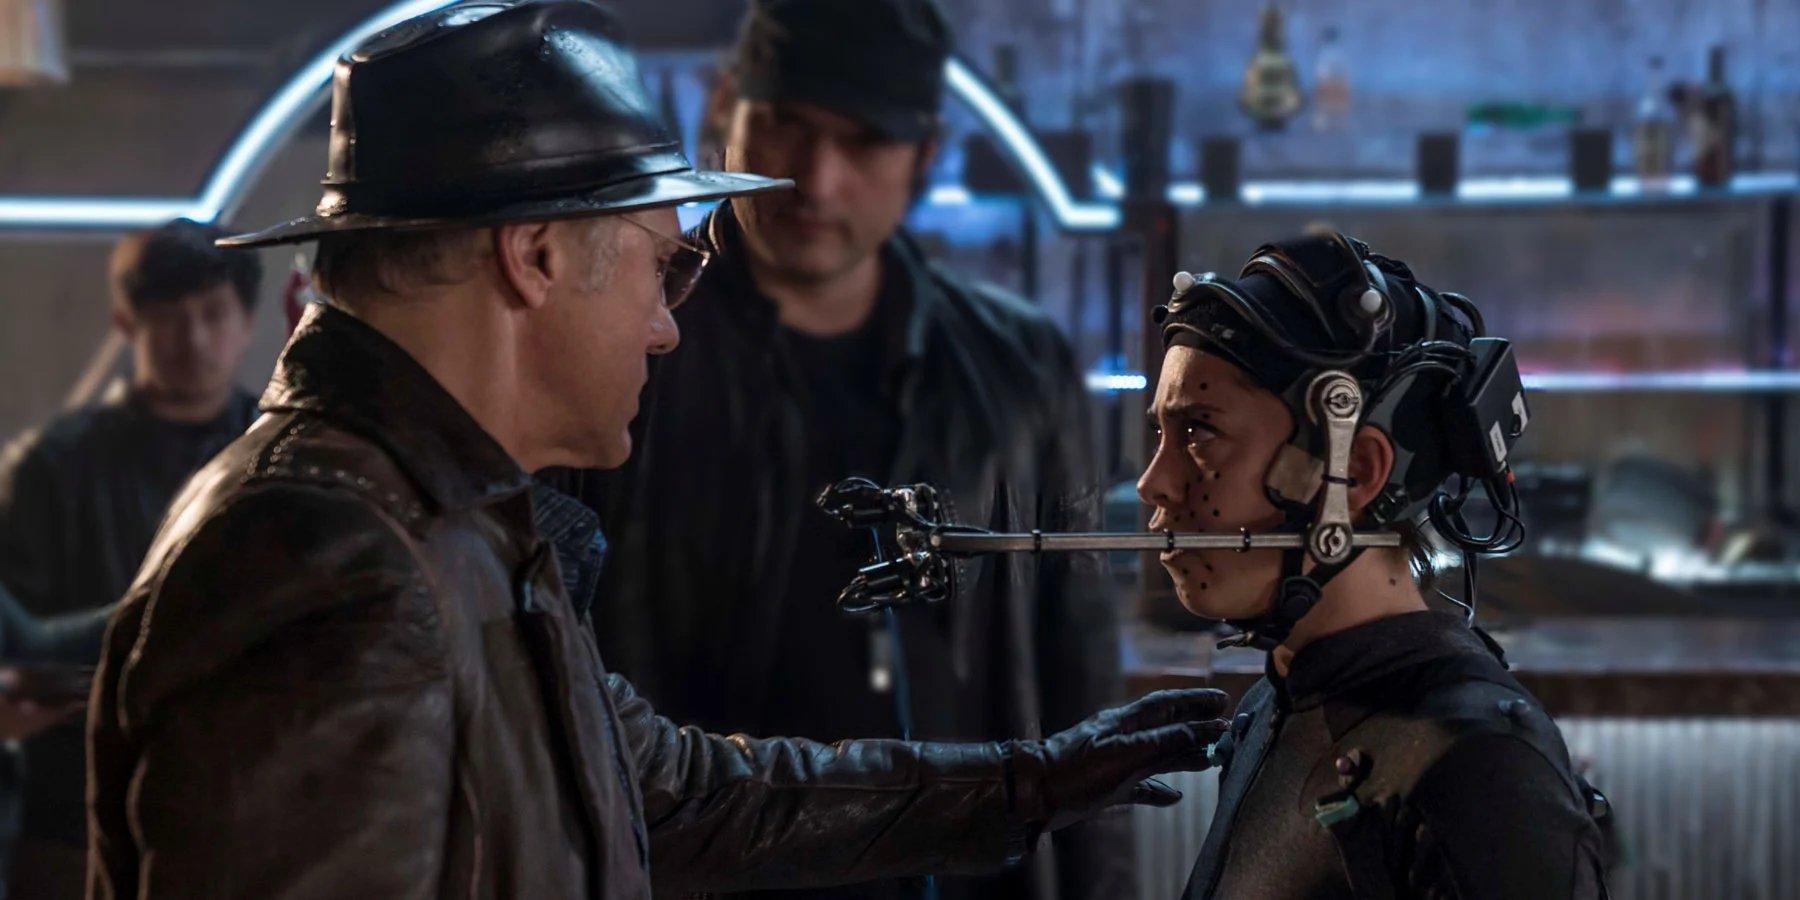 Alita: Battle Angel Robert Rodriguez watches Christoph Waltz and Rosa Salazar on set